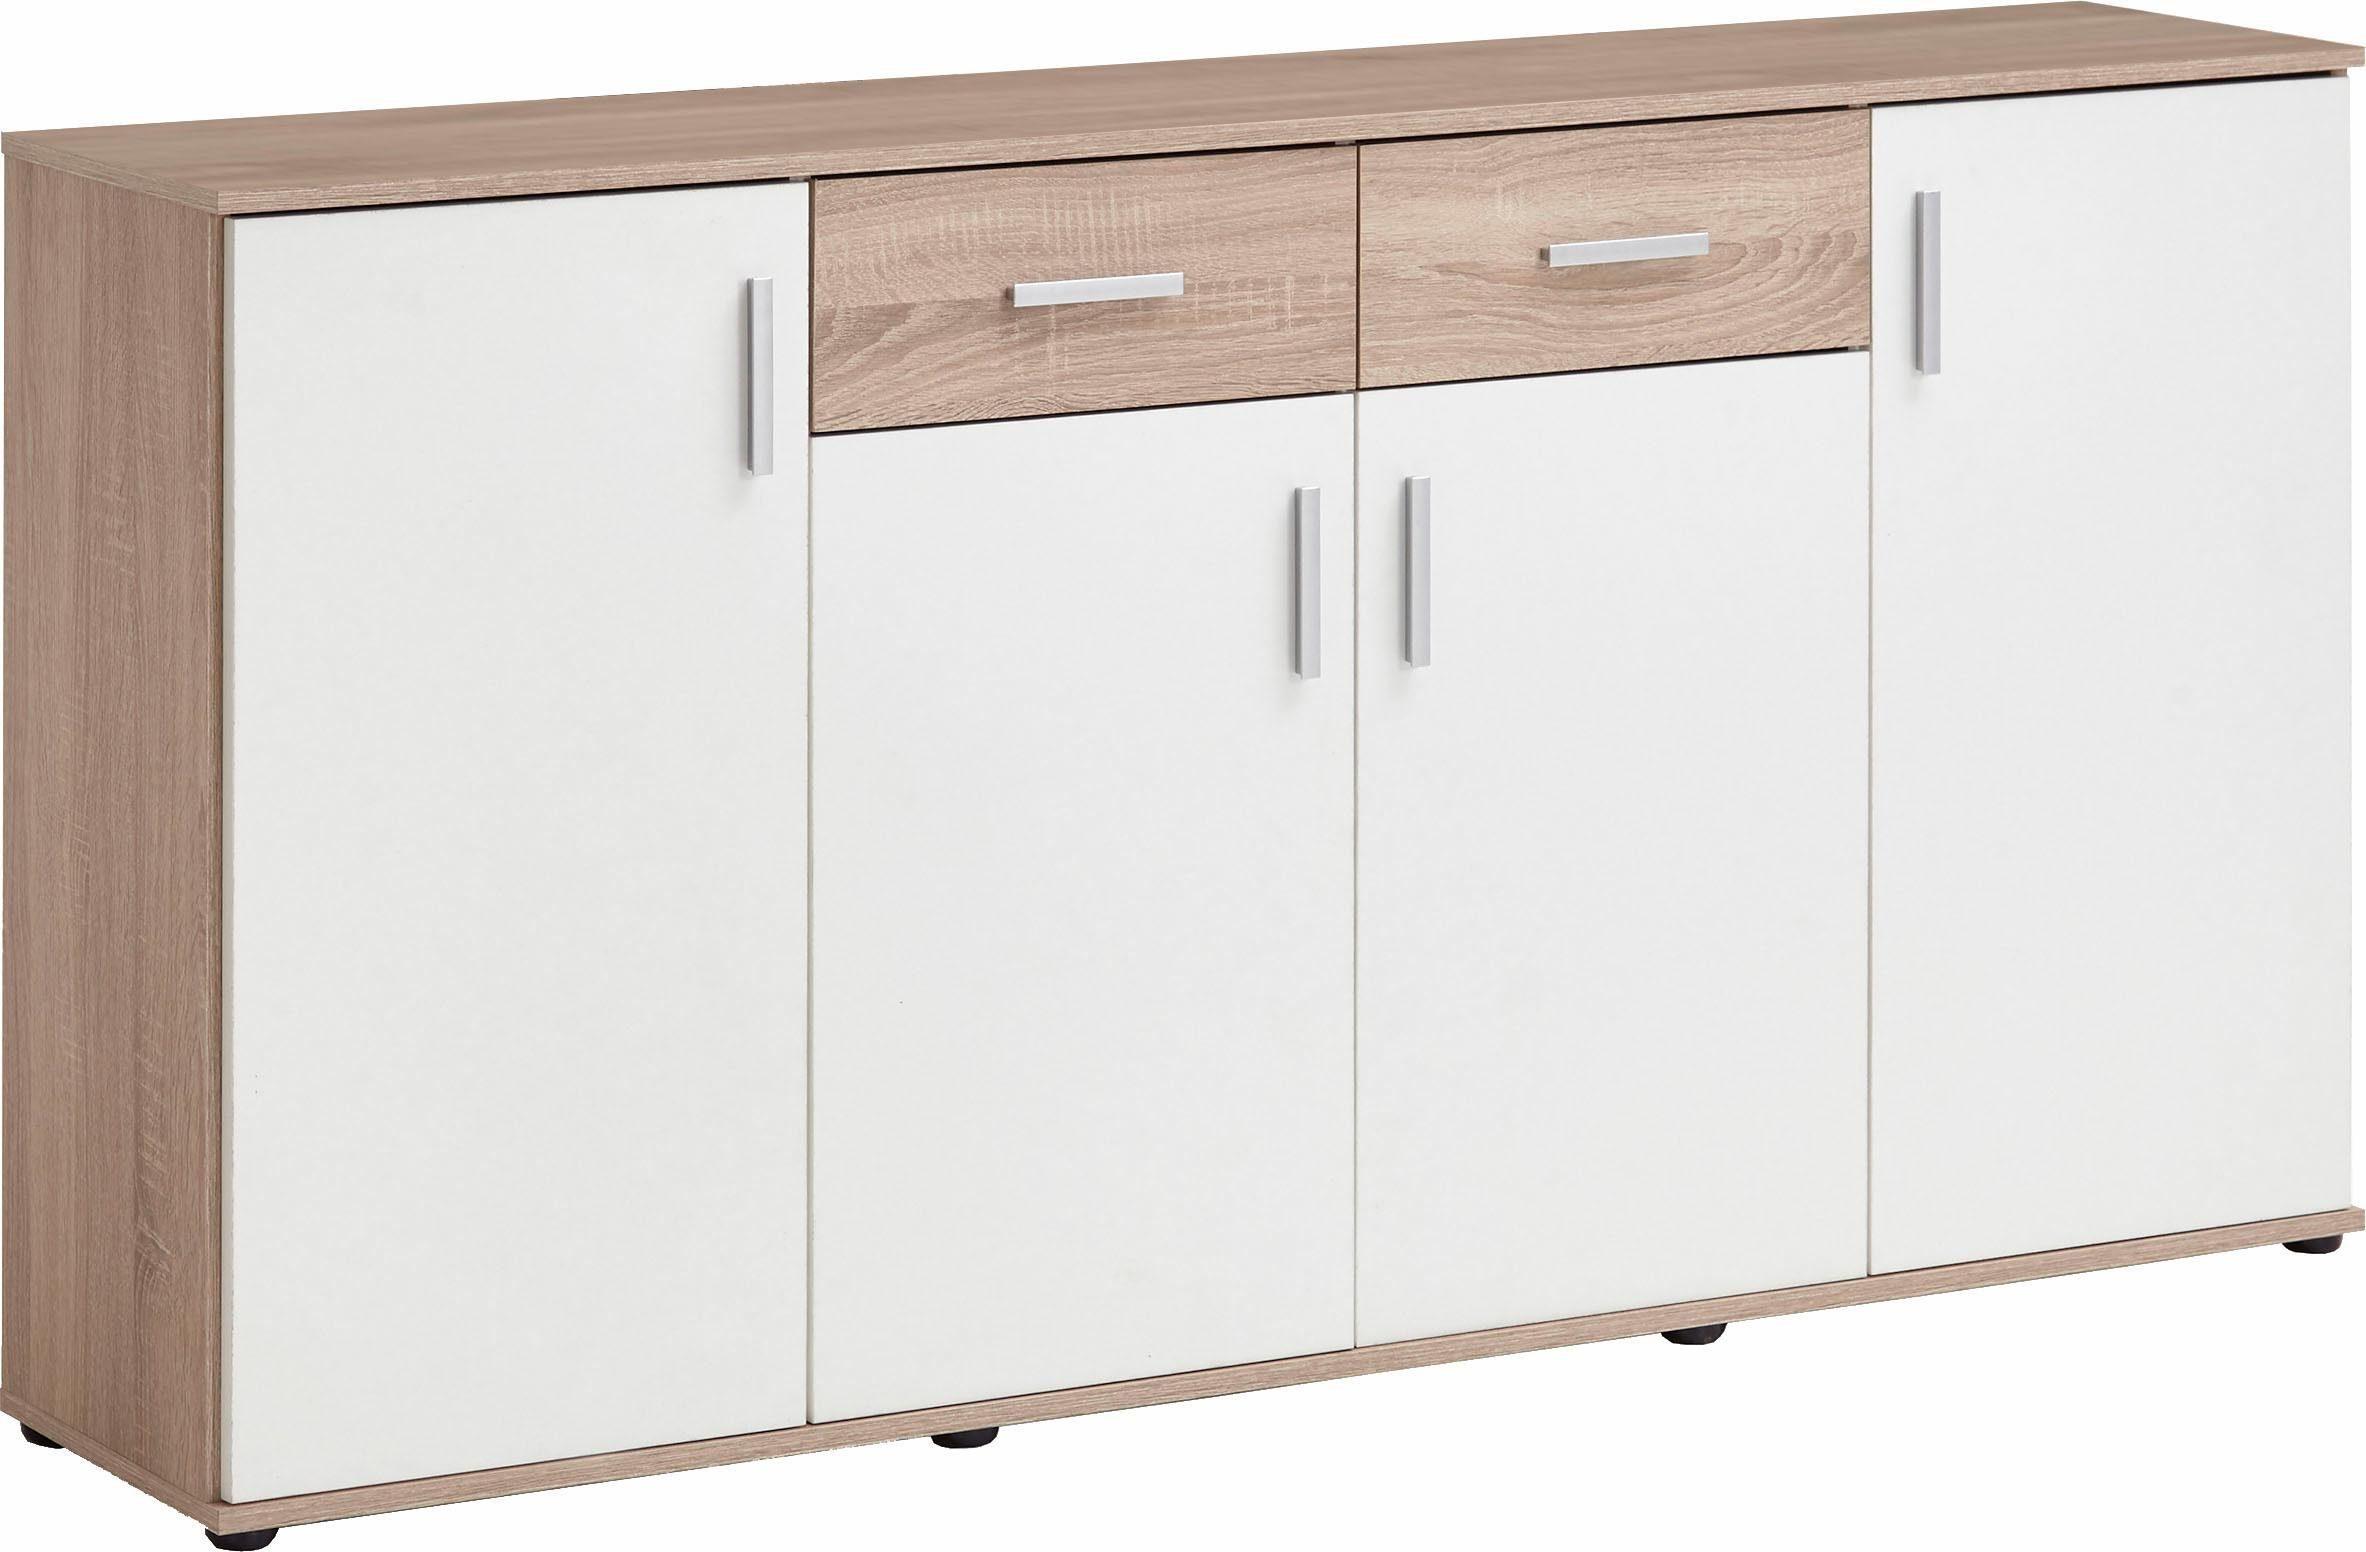 FMD Kommode »Albi 33«, Breite 160 cm